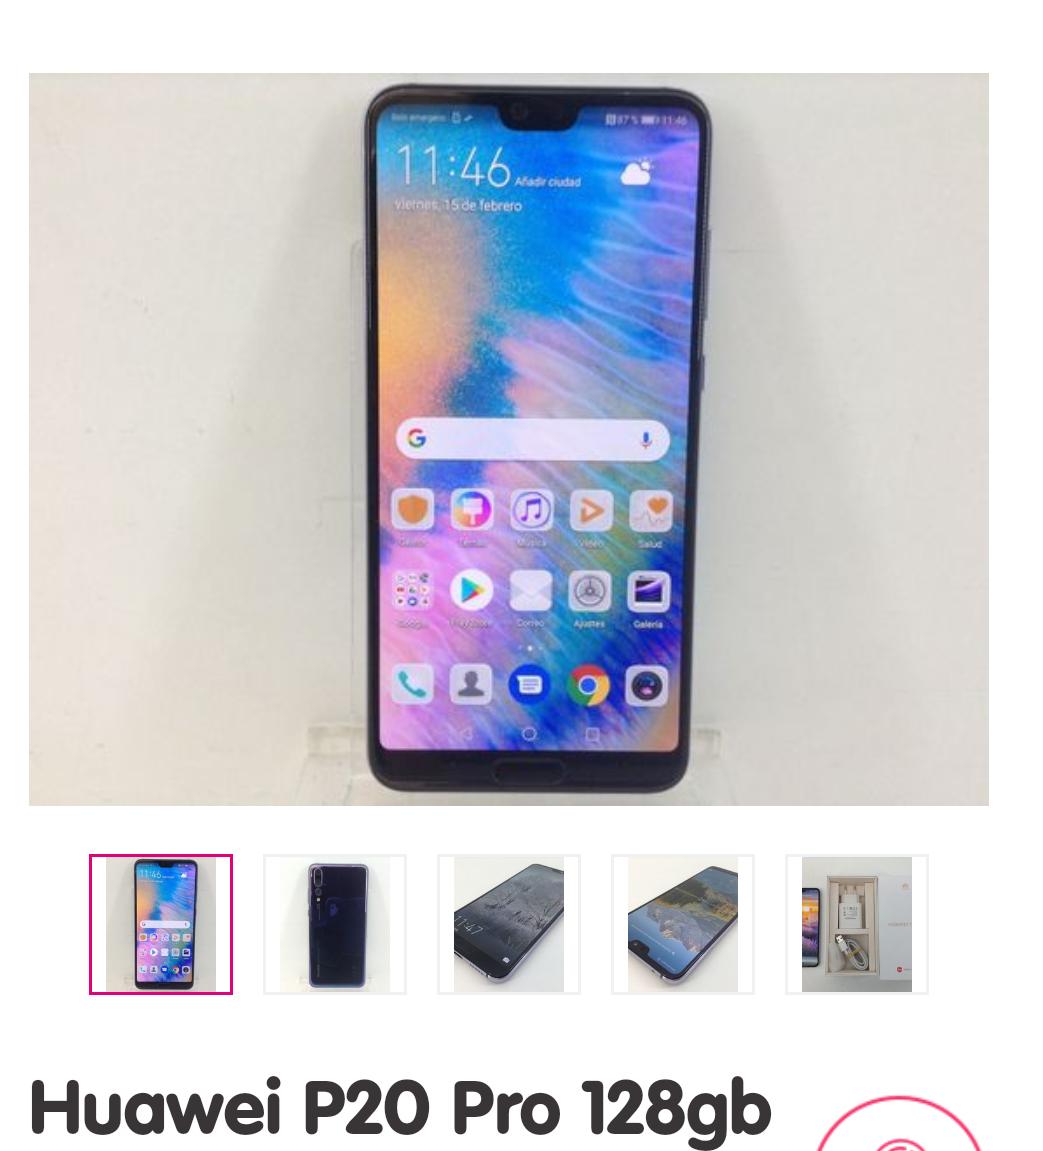 Huawei P20 Pro sin estrenar